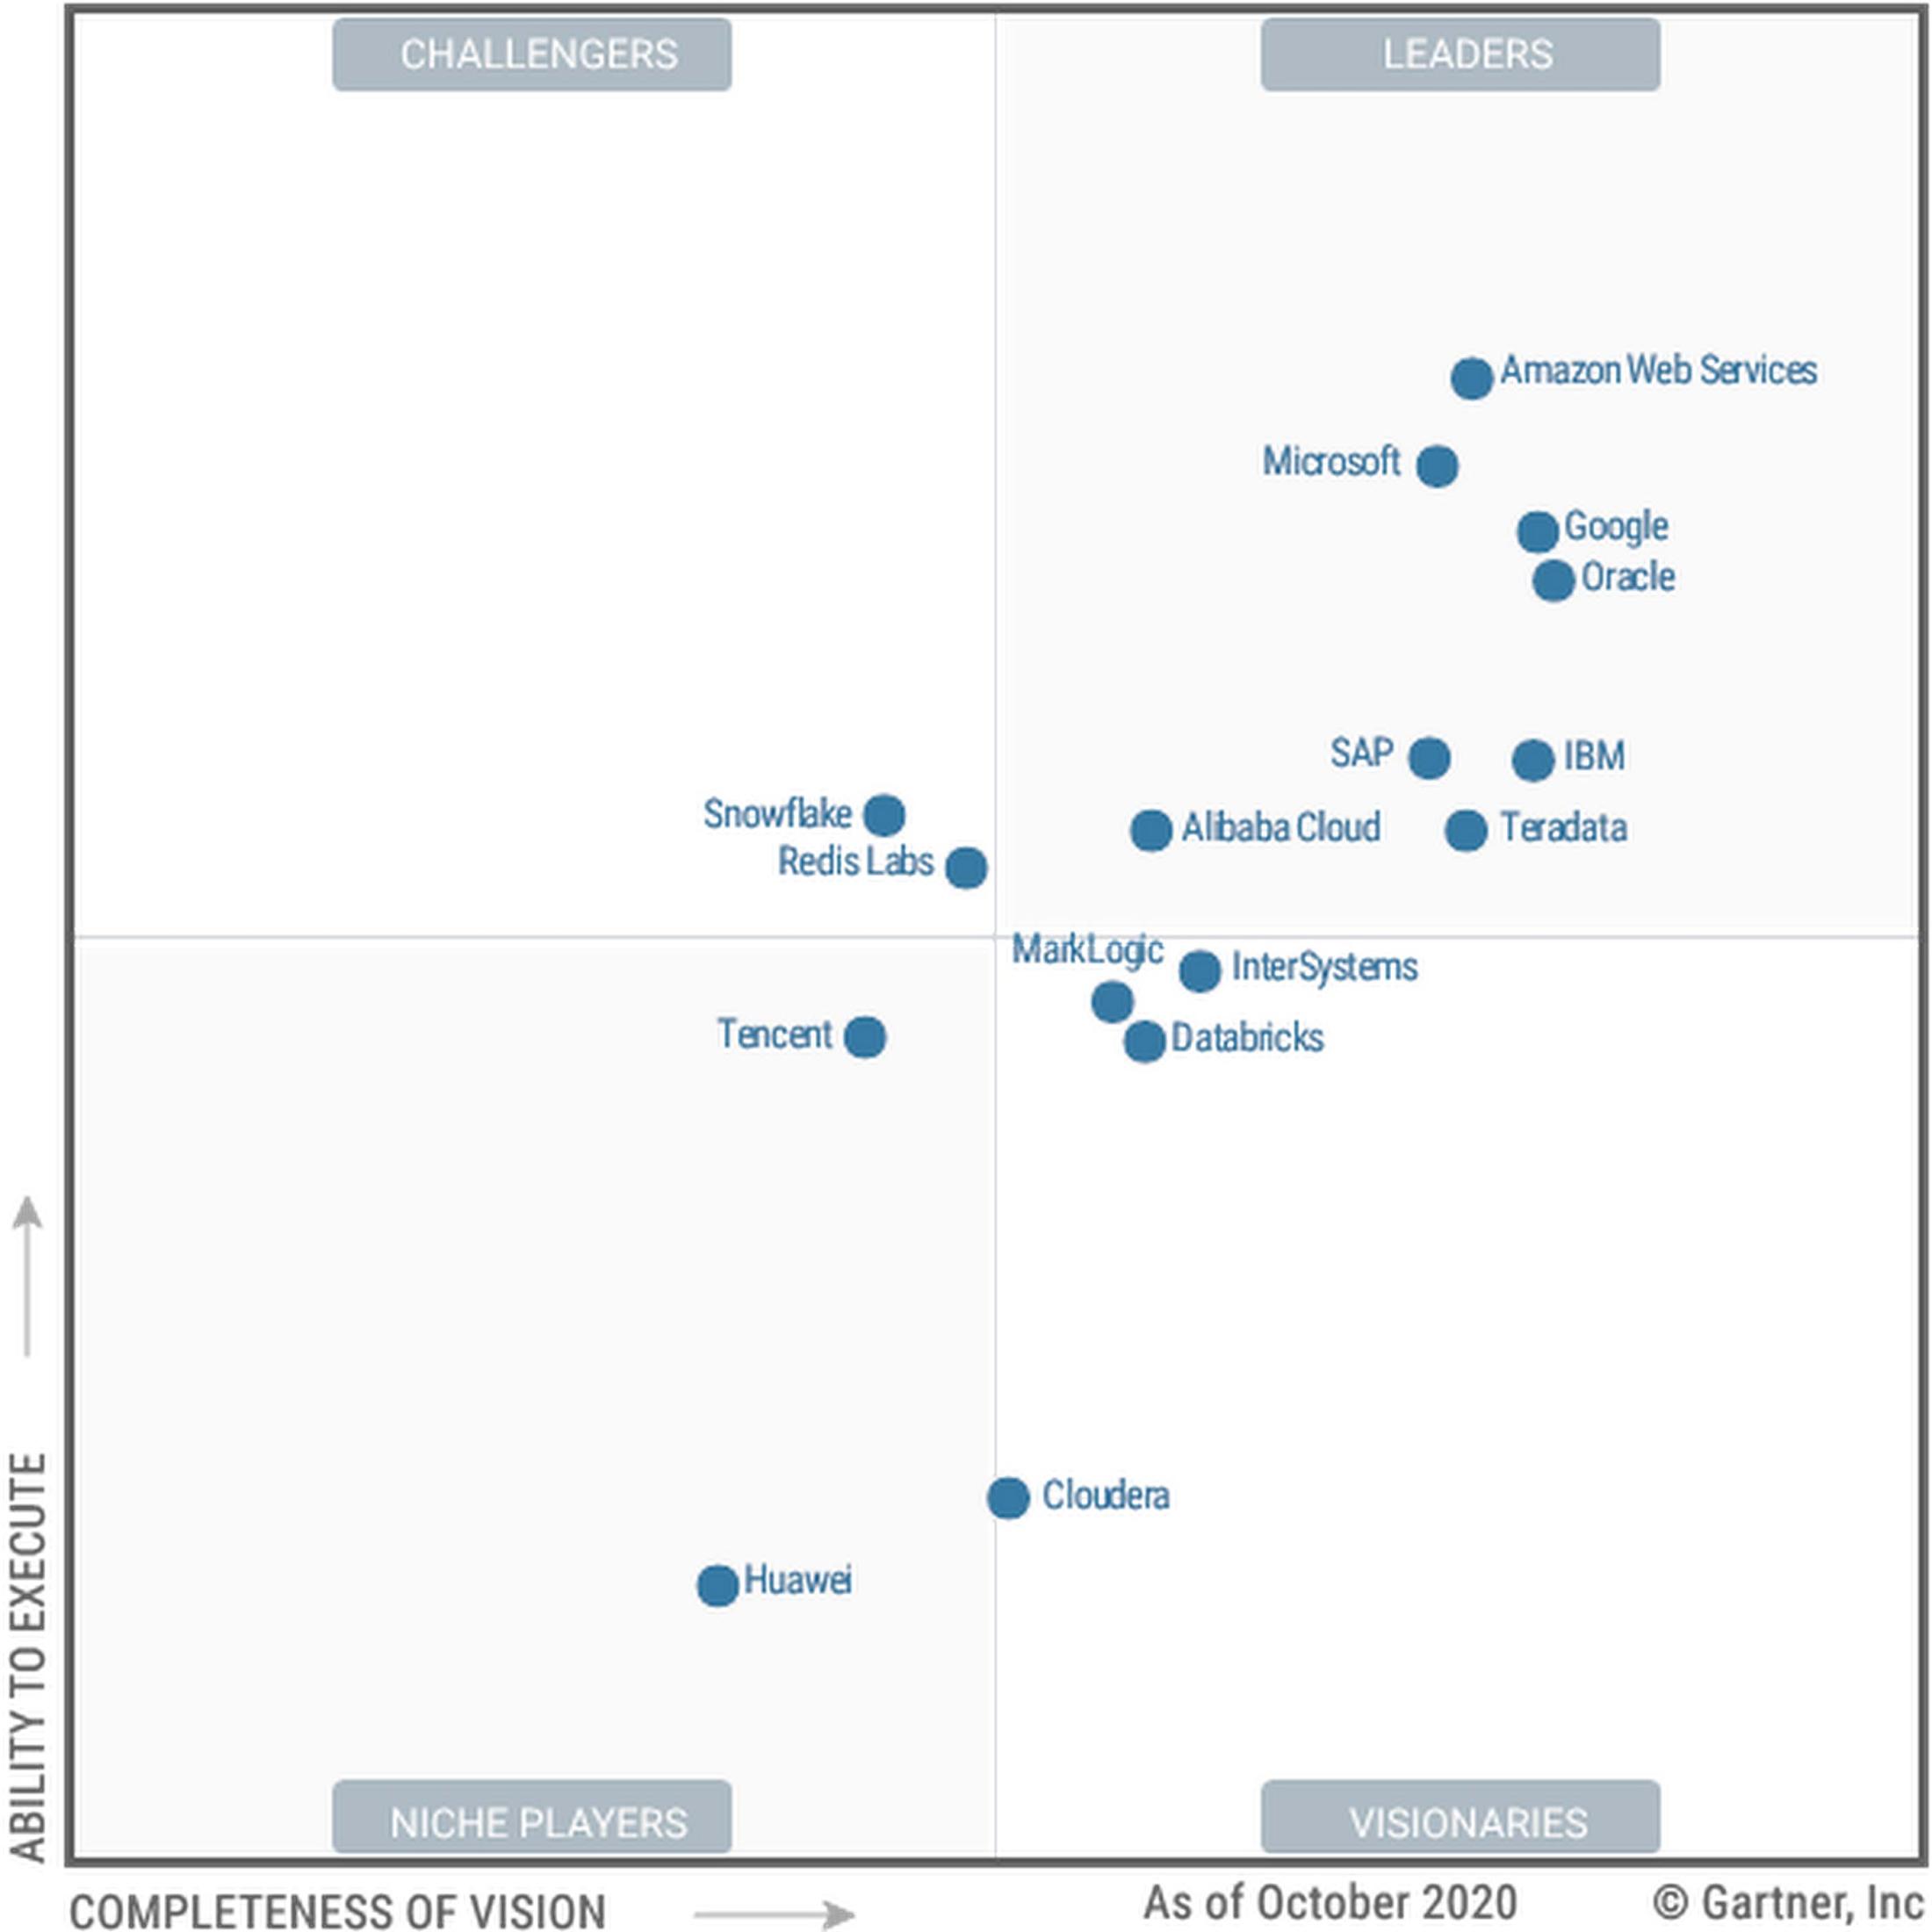 Gartner 2020 Magic Quadrant for Cloud Database Management Systems names Google a Leader